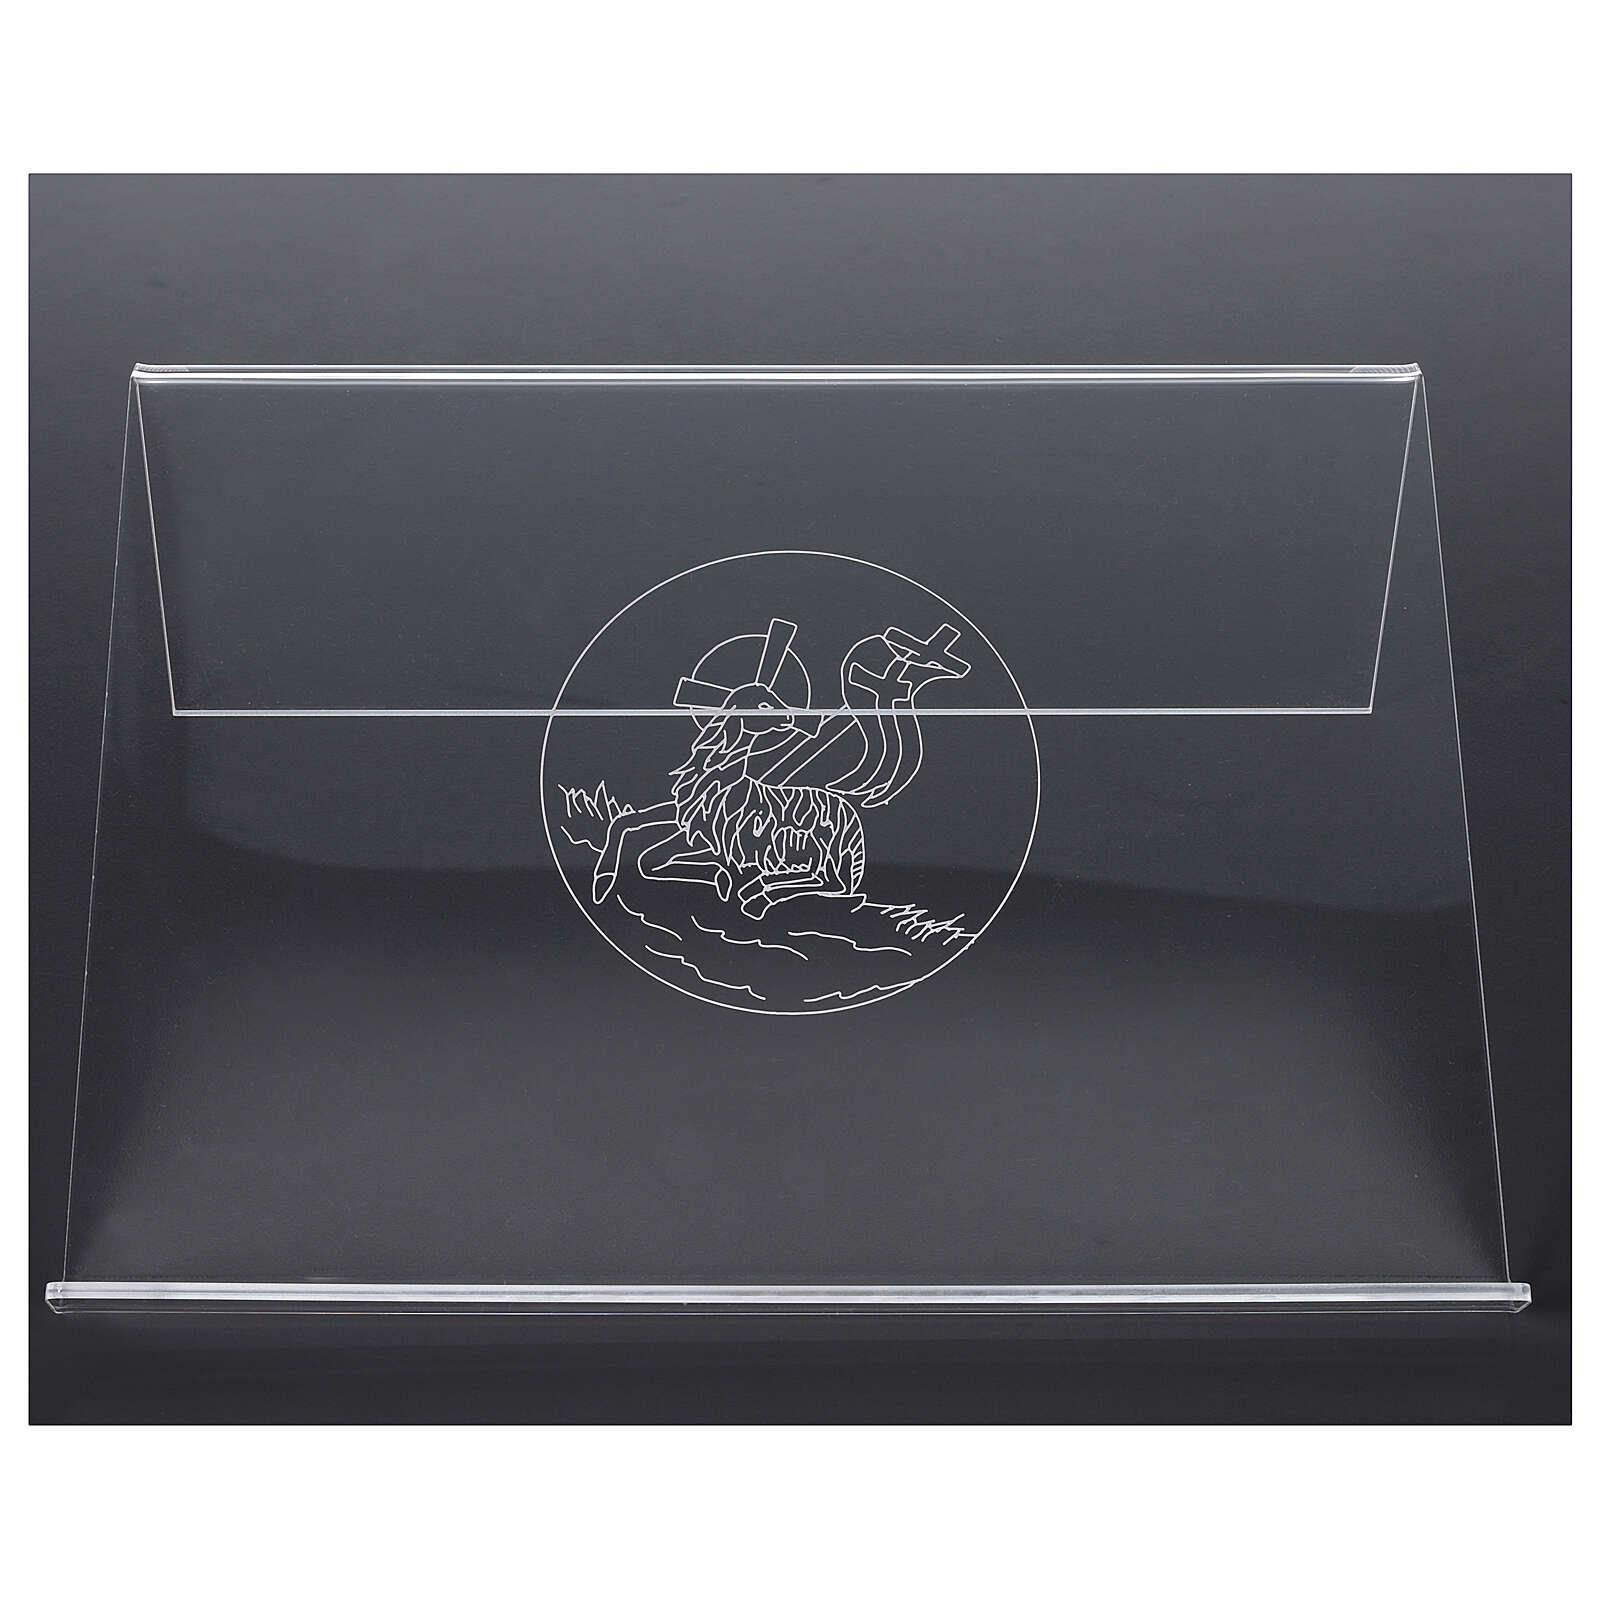 Atril plexiglás con Cordero de la Paz 25x35 cm  4